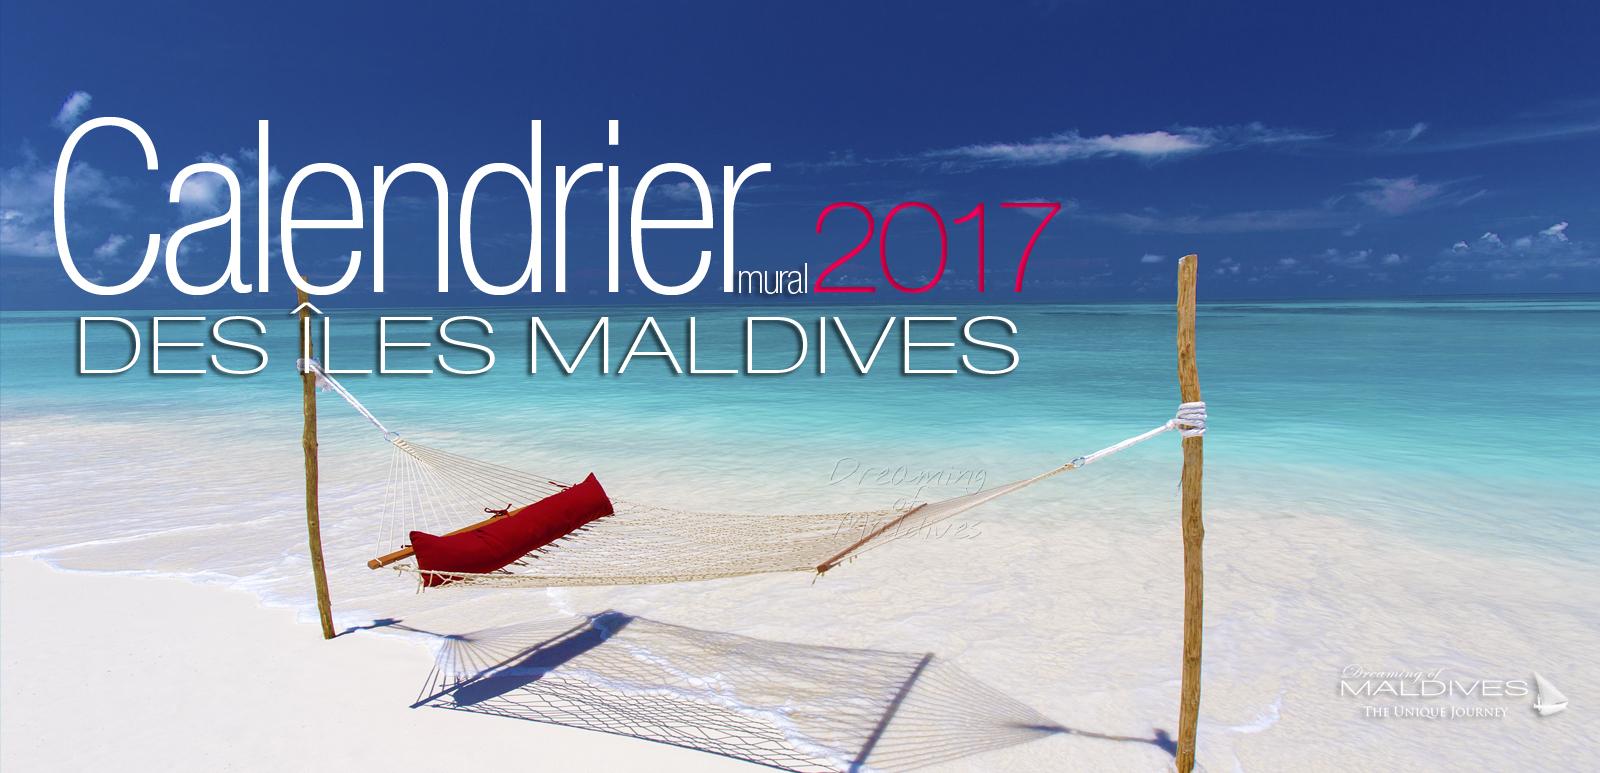 Nos editions dreaming of maldives blog des maldives for Calendrier electronique mural francais